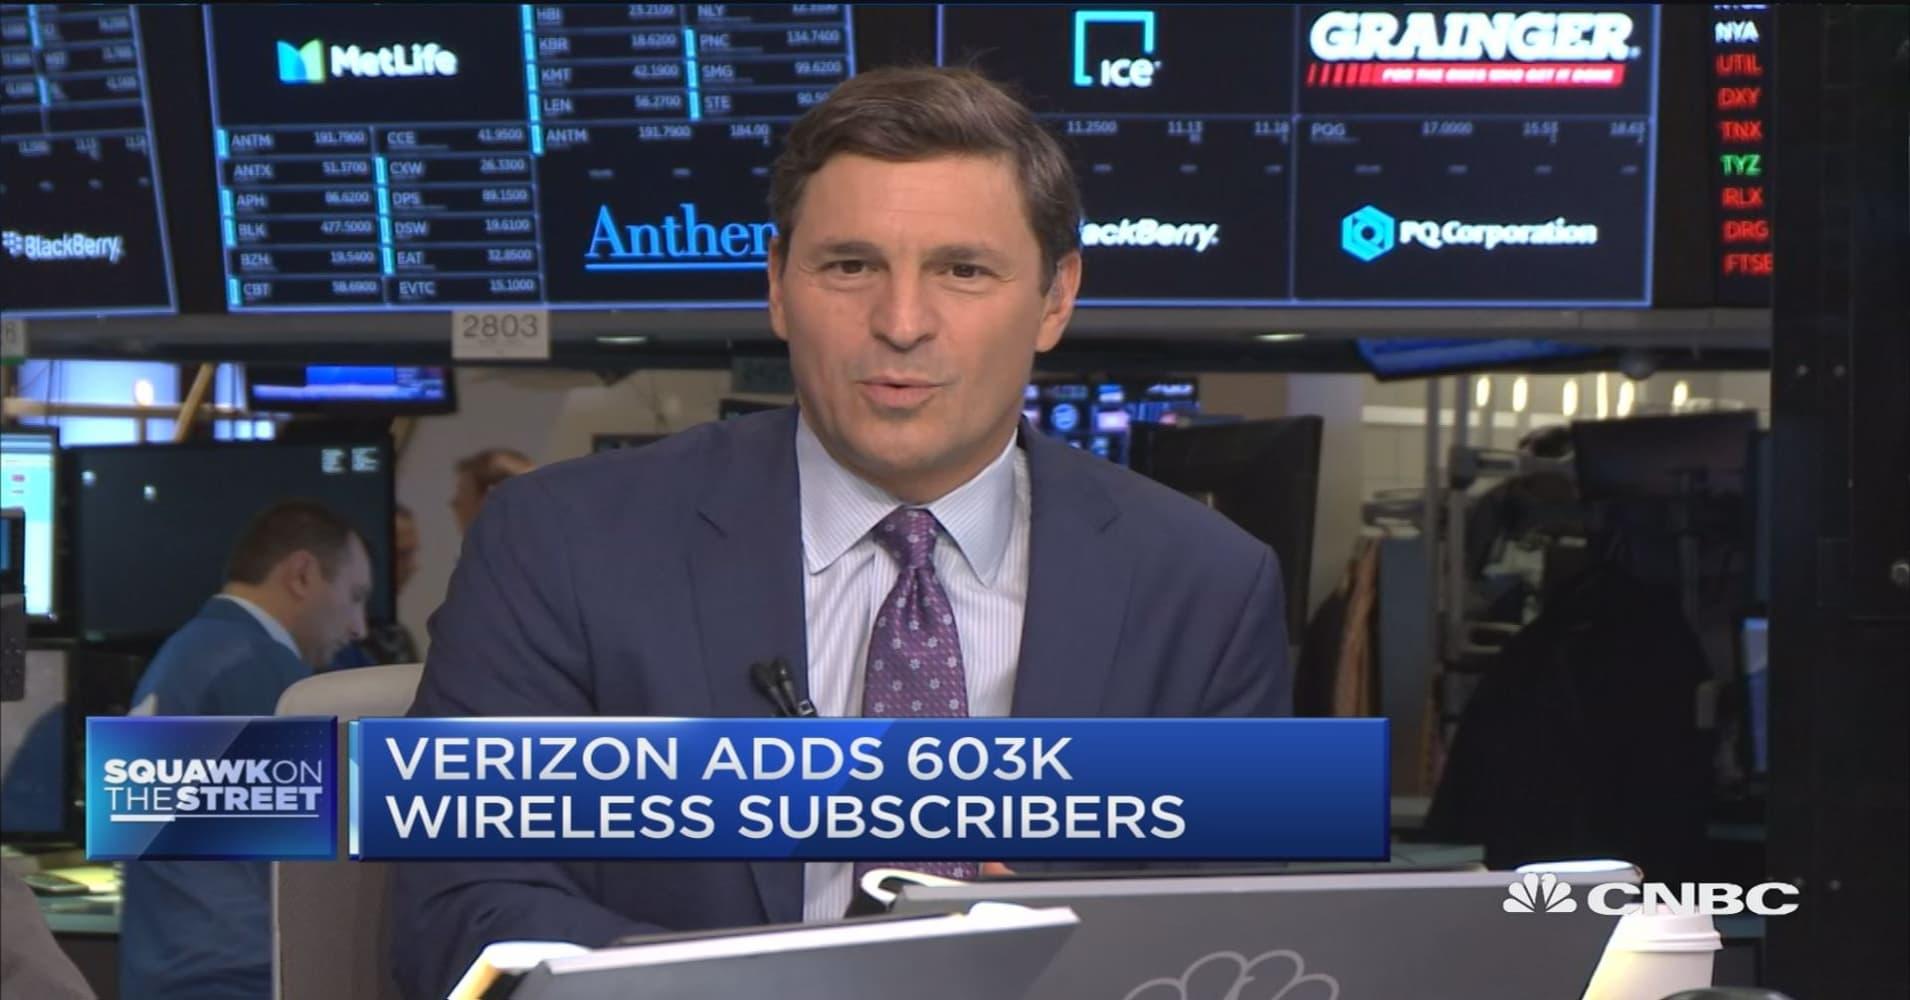 Verizon loses 18K FIOS video customers, adds 603K wireless subscribers